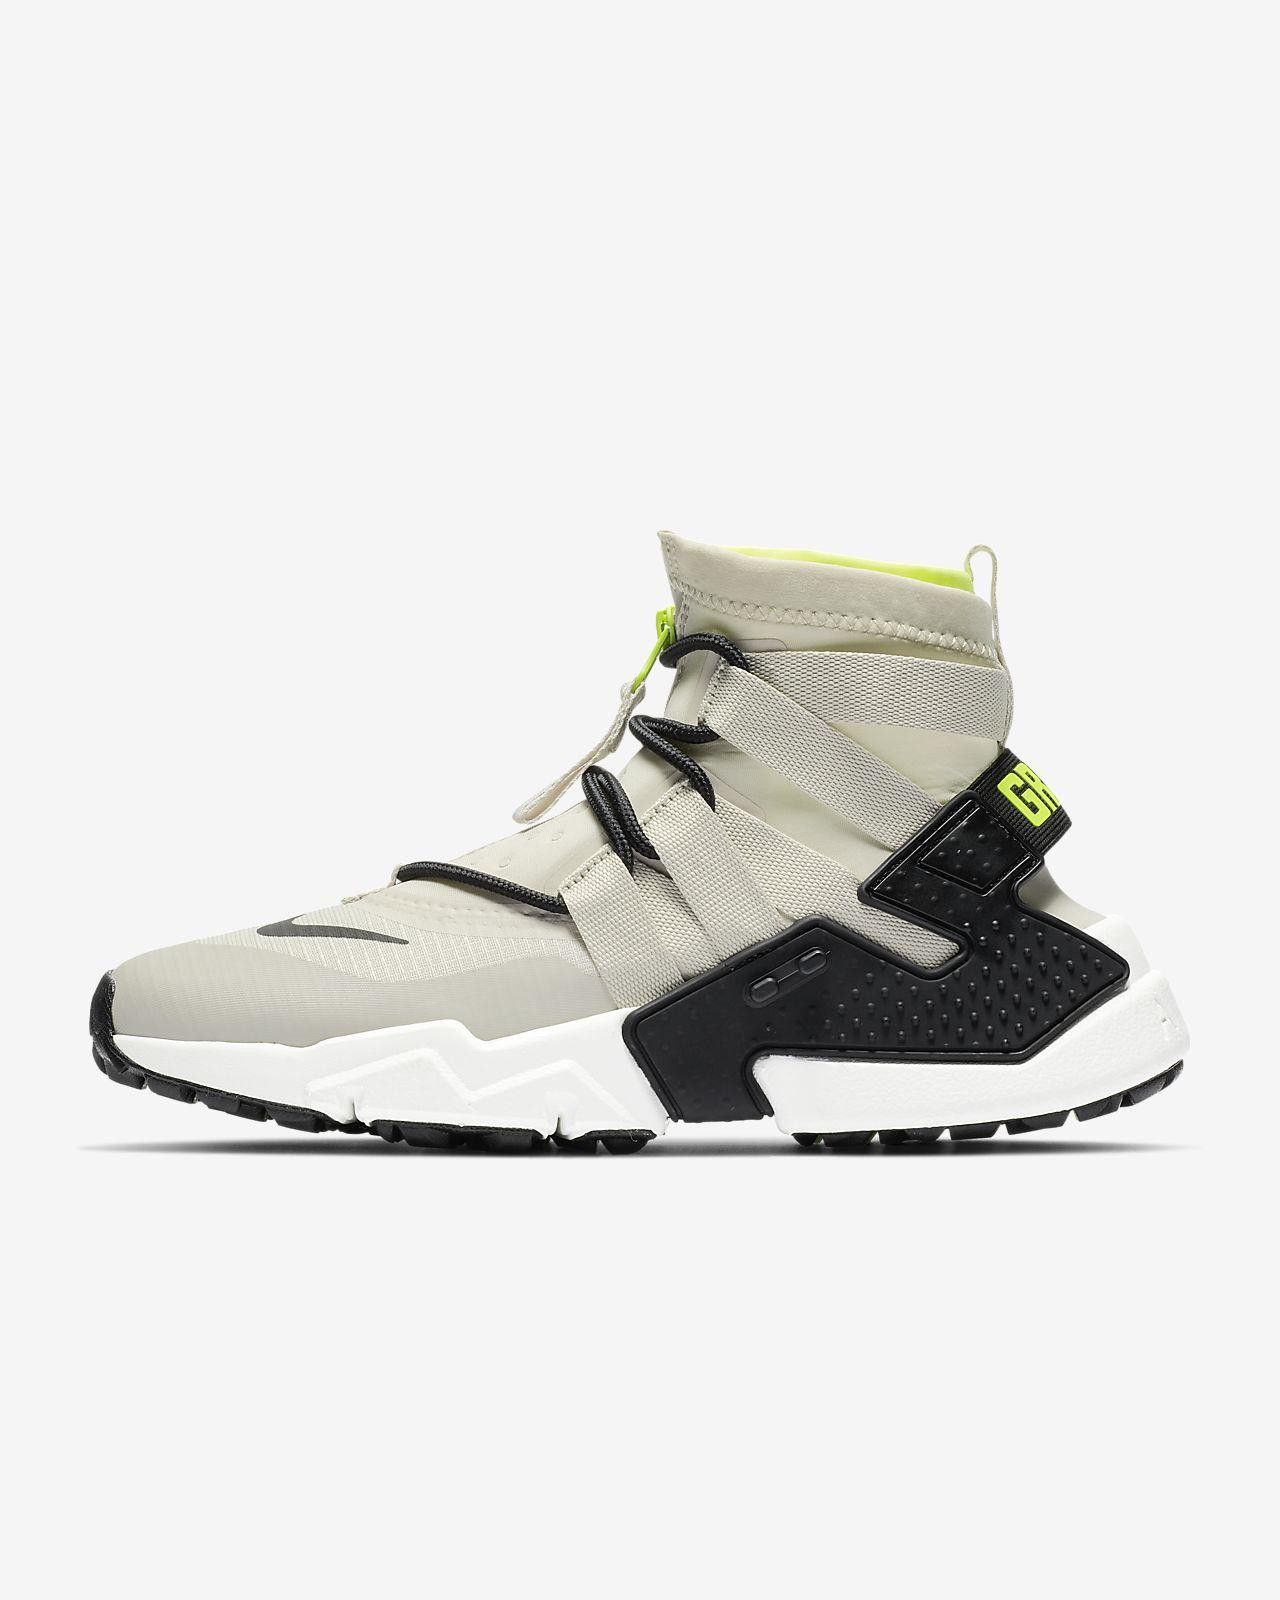 437f7760ba5ce Nike Air Huarache Gripp Men s Shoe. Nike.com ID